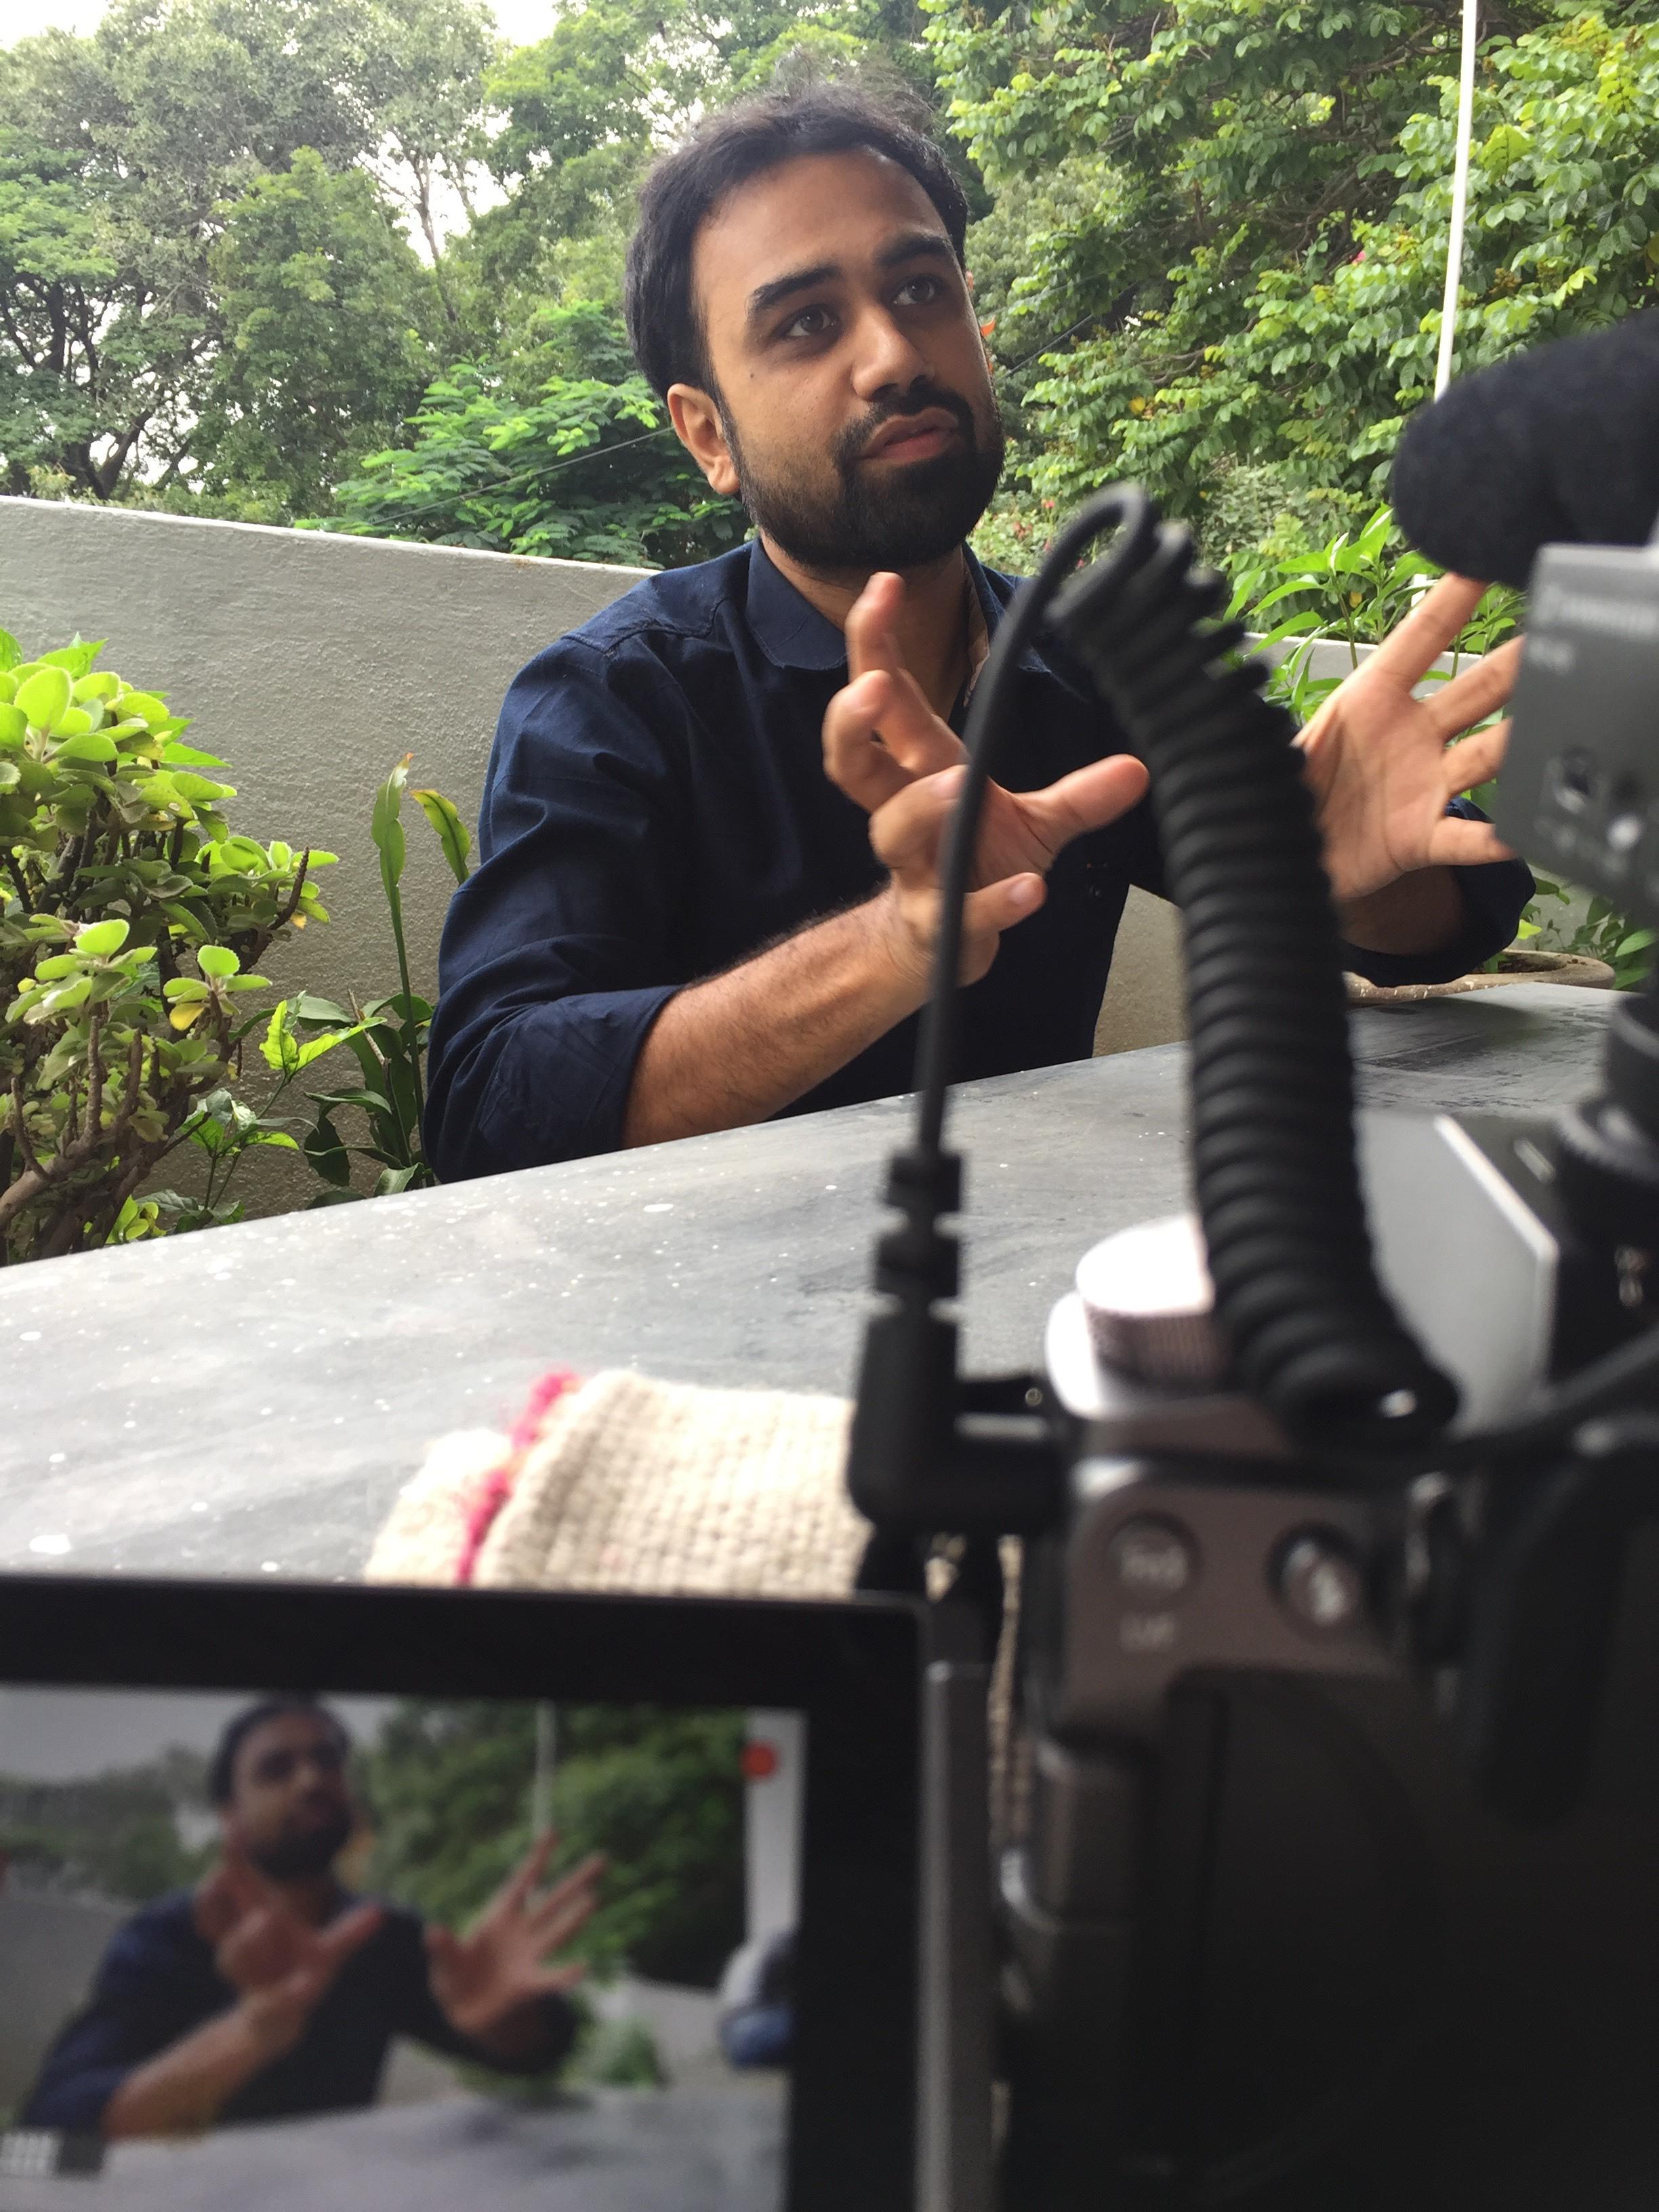 My friend Rohit, Cinema Therapist